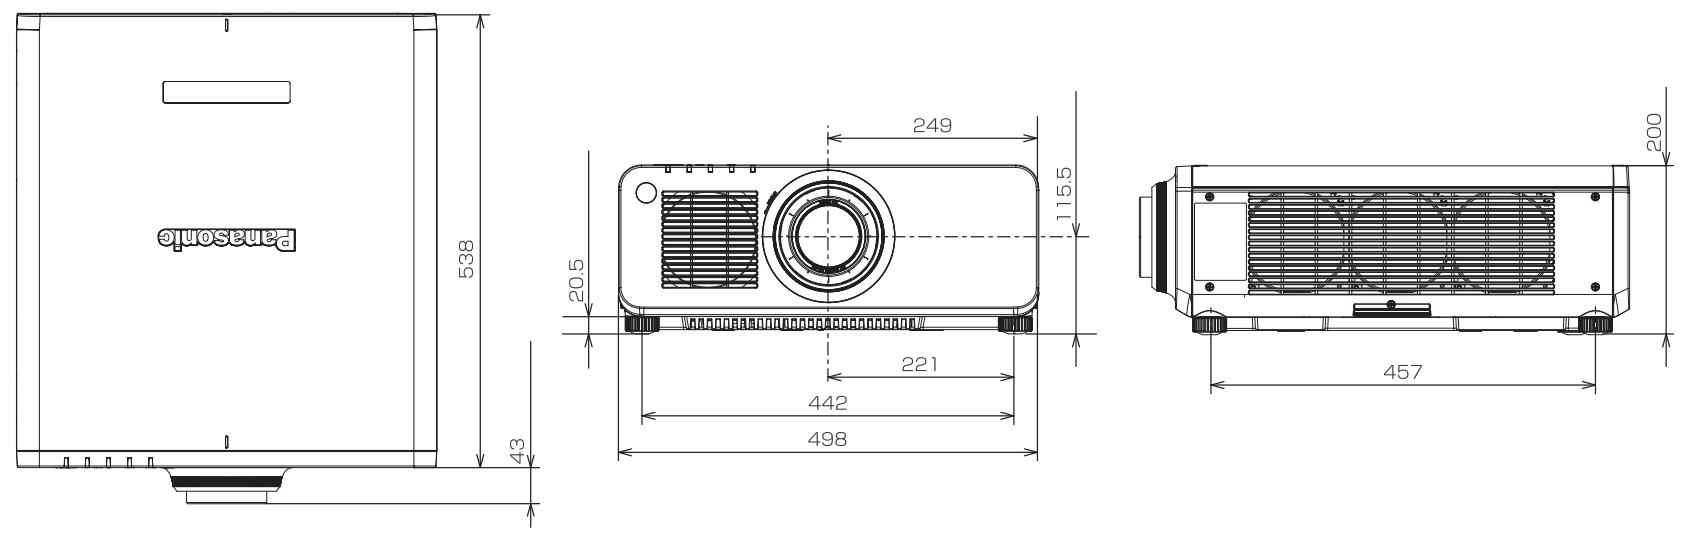 Panasonic 1チップDLPプロジェクター(PT-RZ970JB)